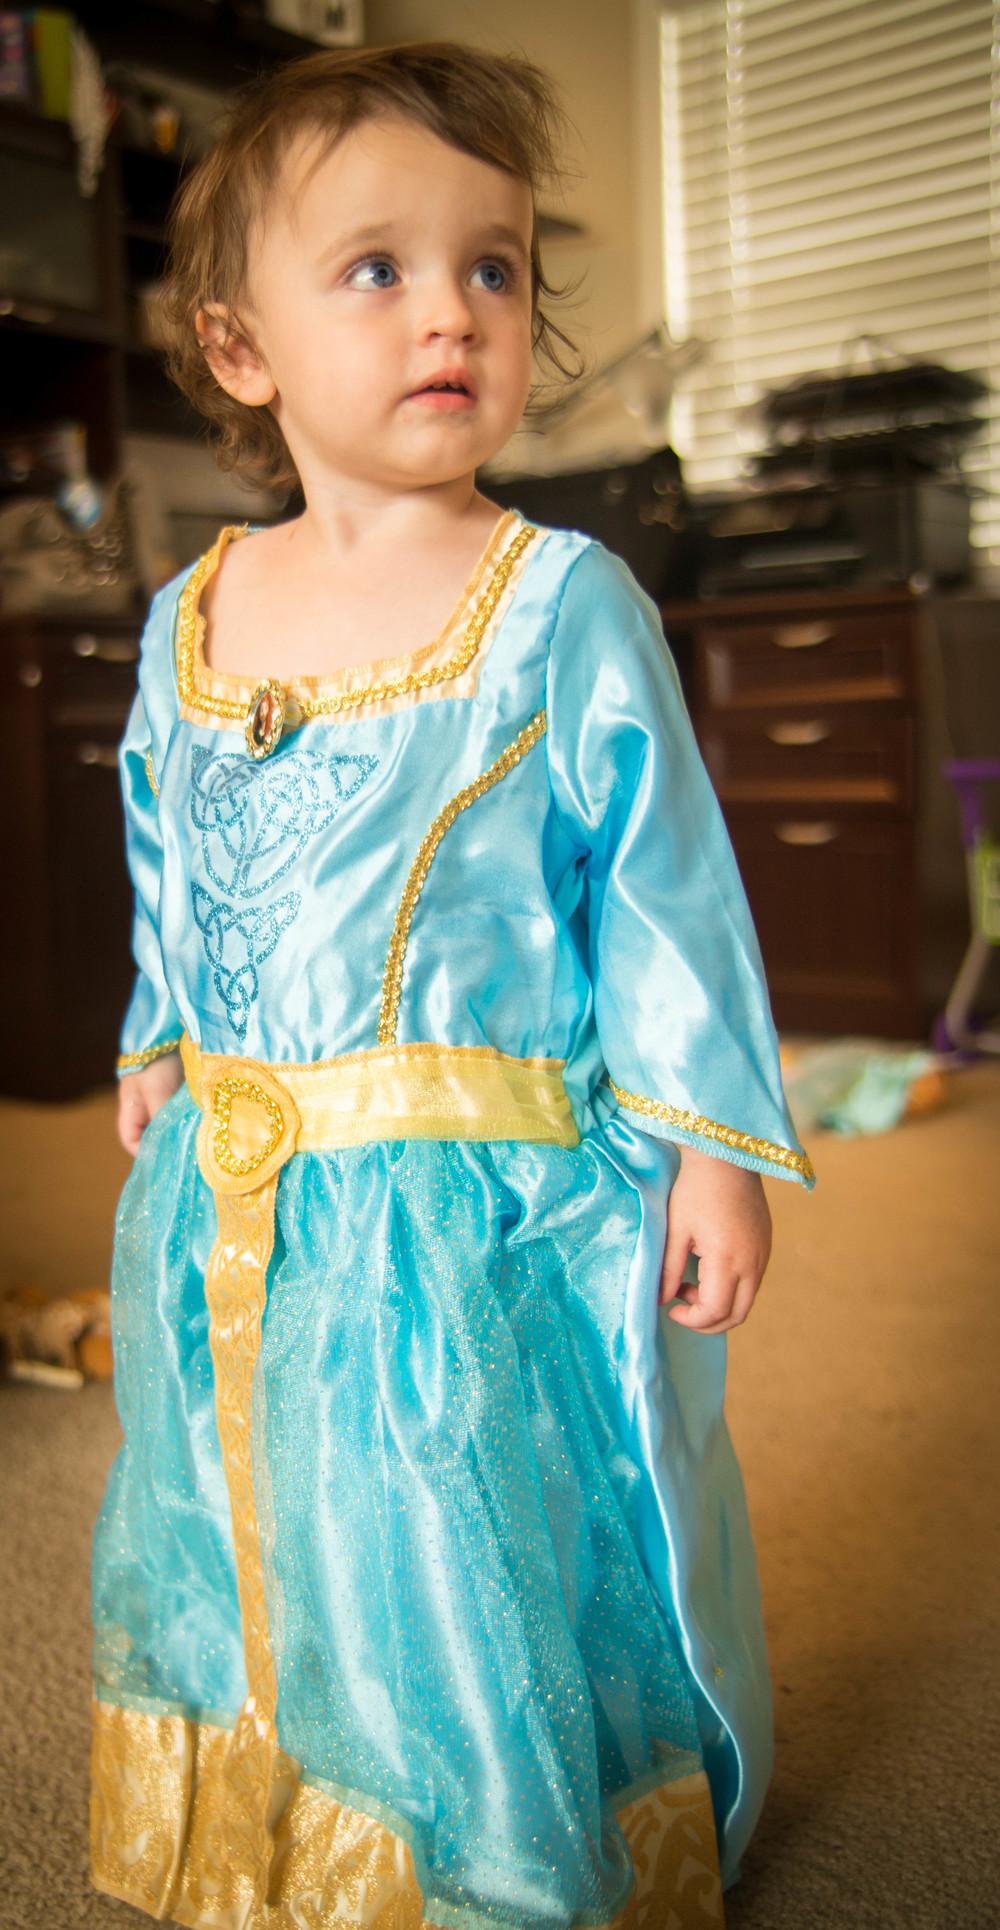 Brave Princess Daphne